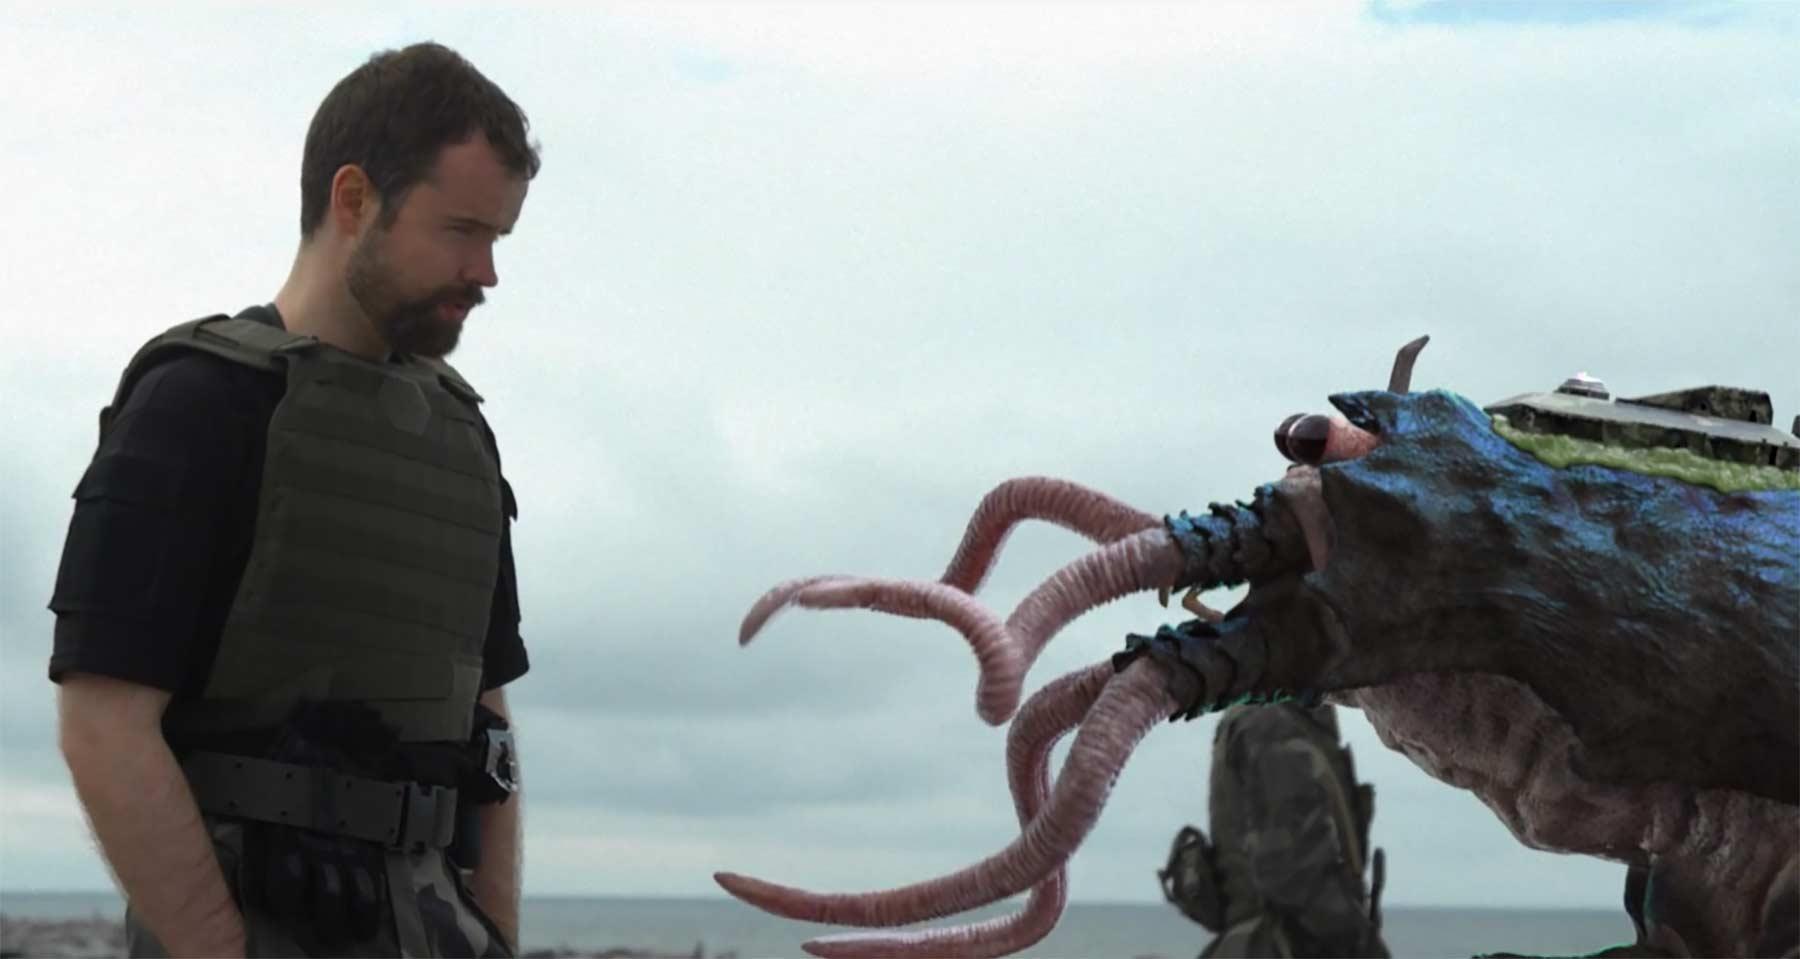 Waffenhandel mit Alien-Käfern good-business-scifi-kurzfilm